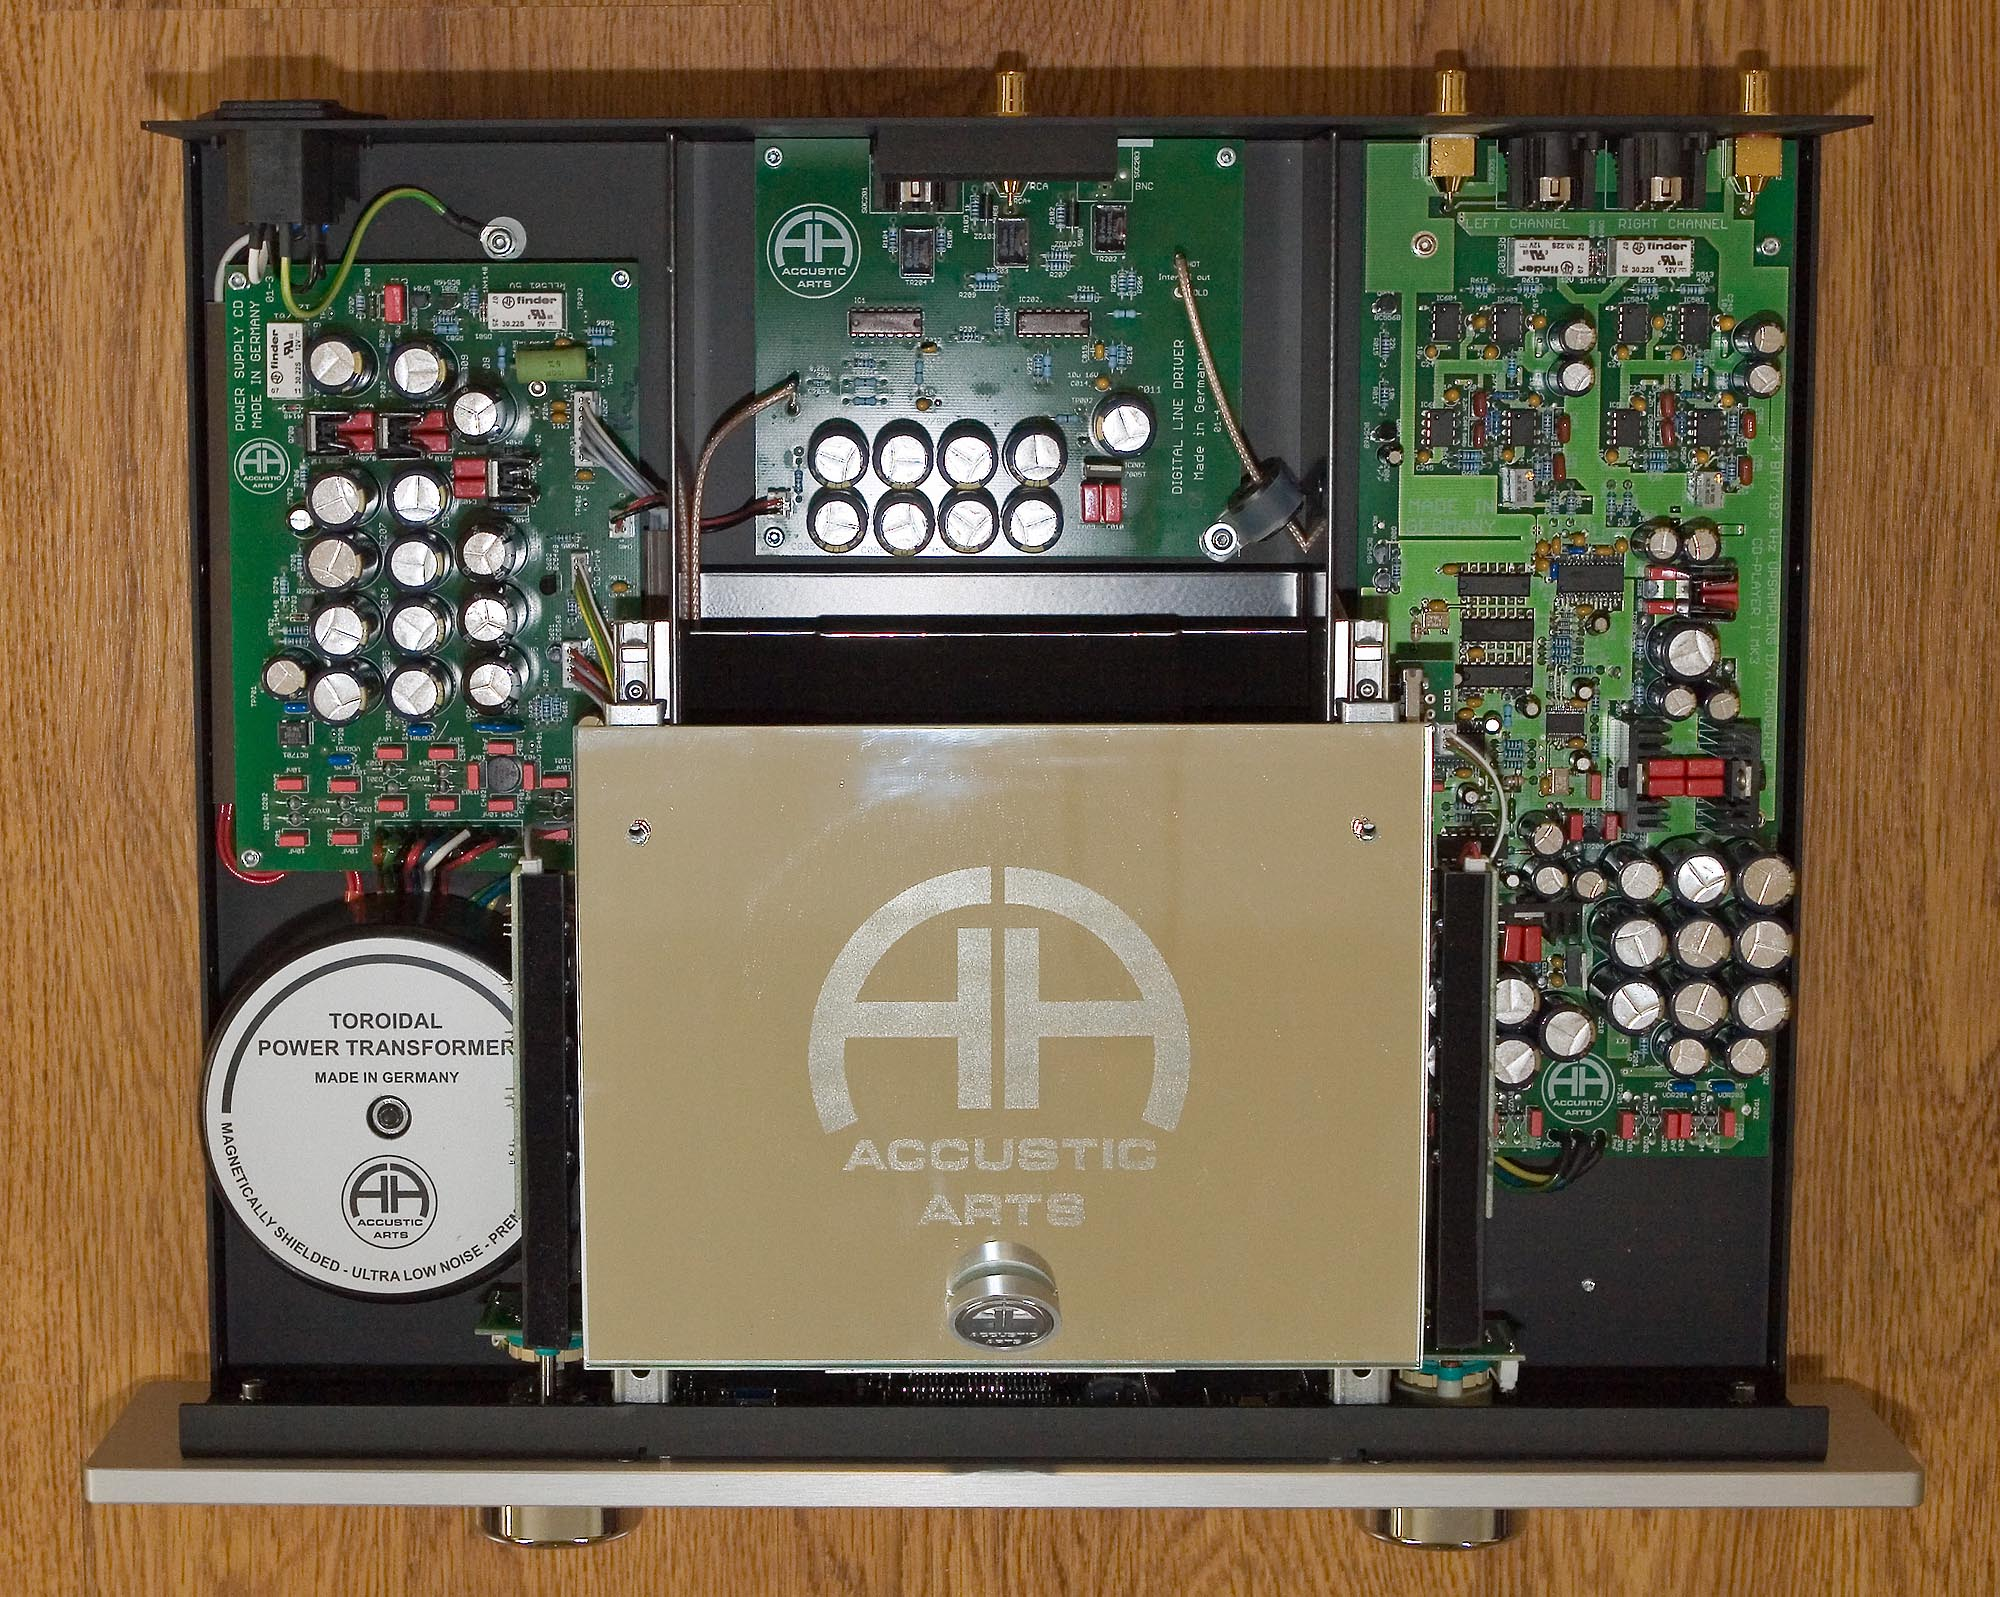 6moons audio reviews accustic arts cd player i mkiii